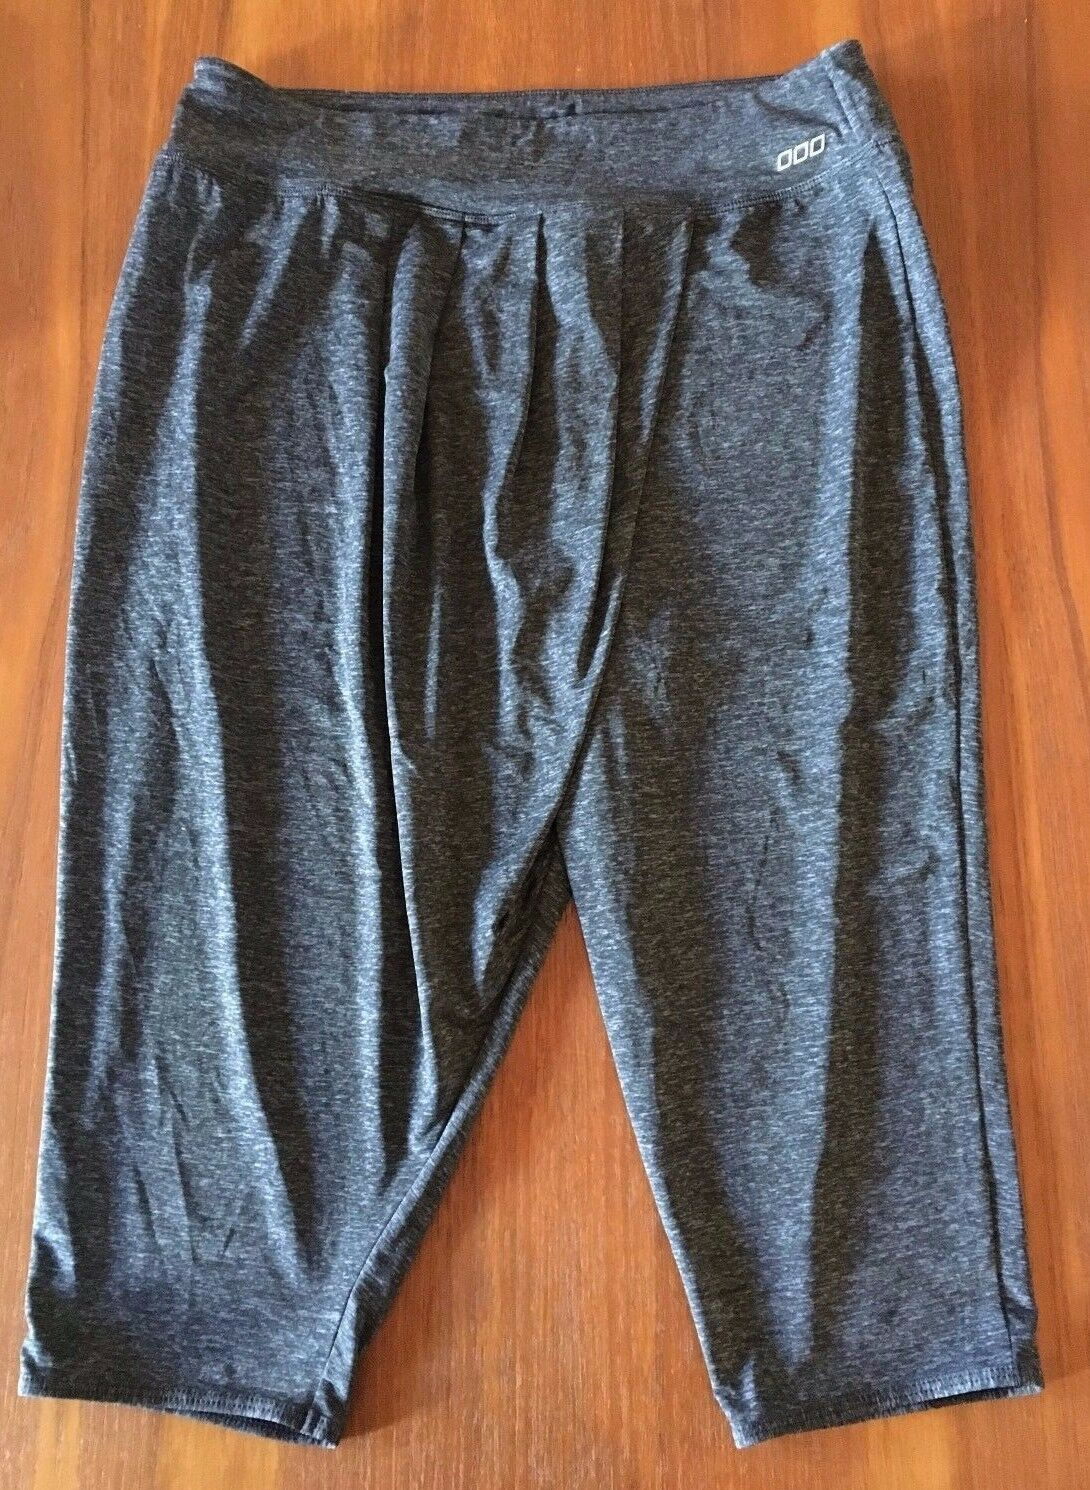 LORNA JANE Dark Grey Marle Drape Pleat Cross Front Loose Knee Length Pants S